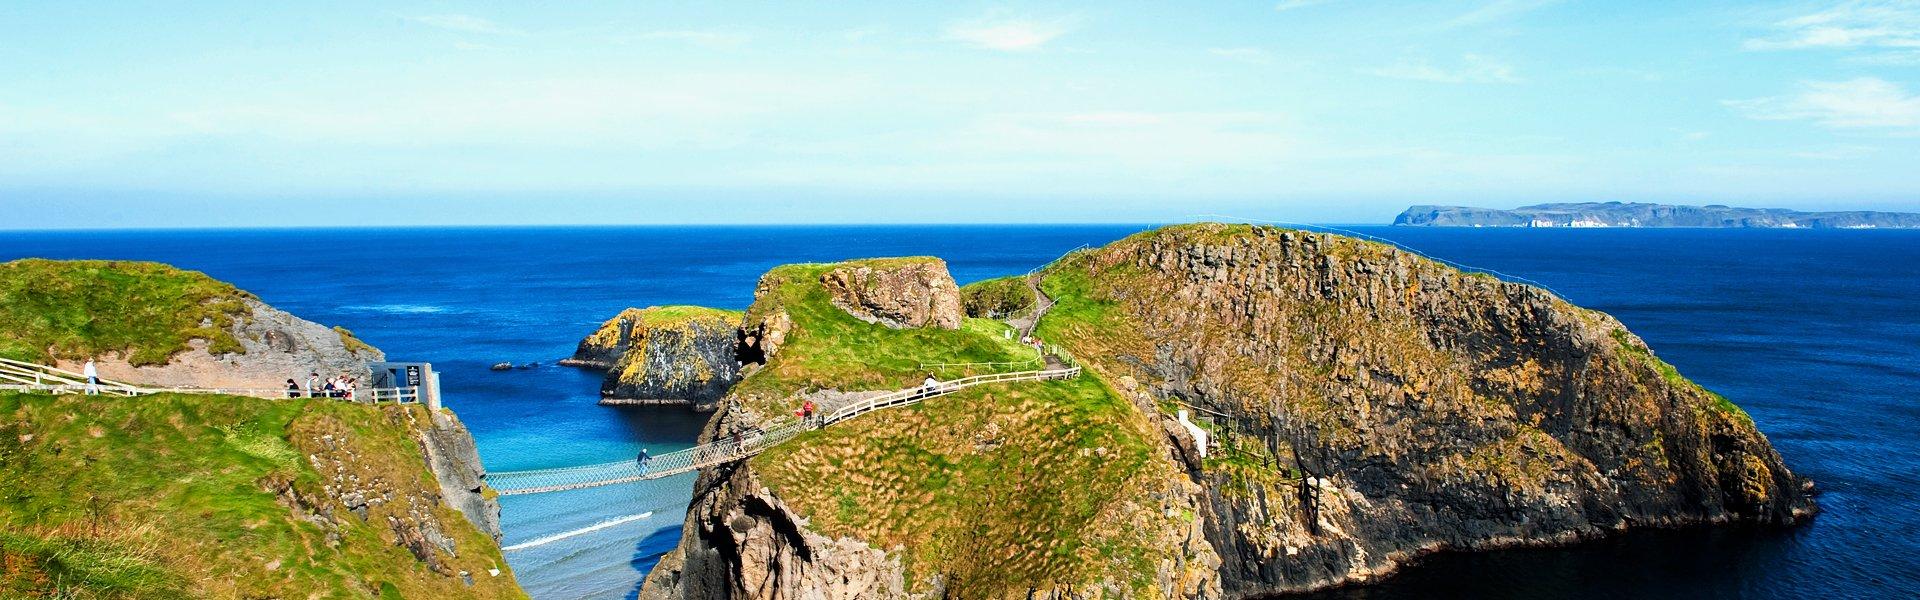 Carrick a Rede, Noord-Ierland, Groot-Brittannië